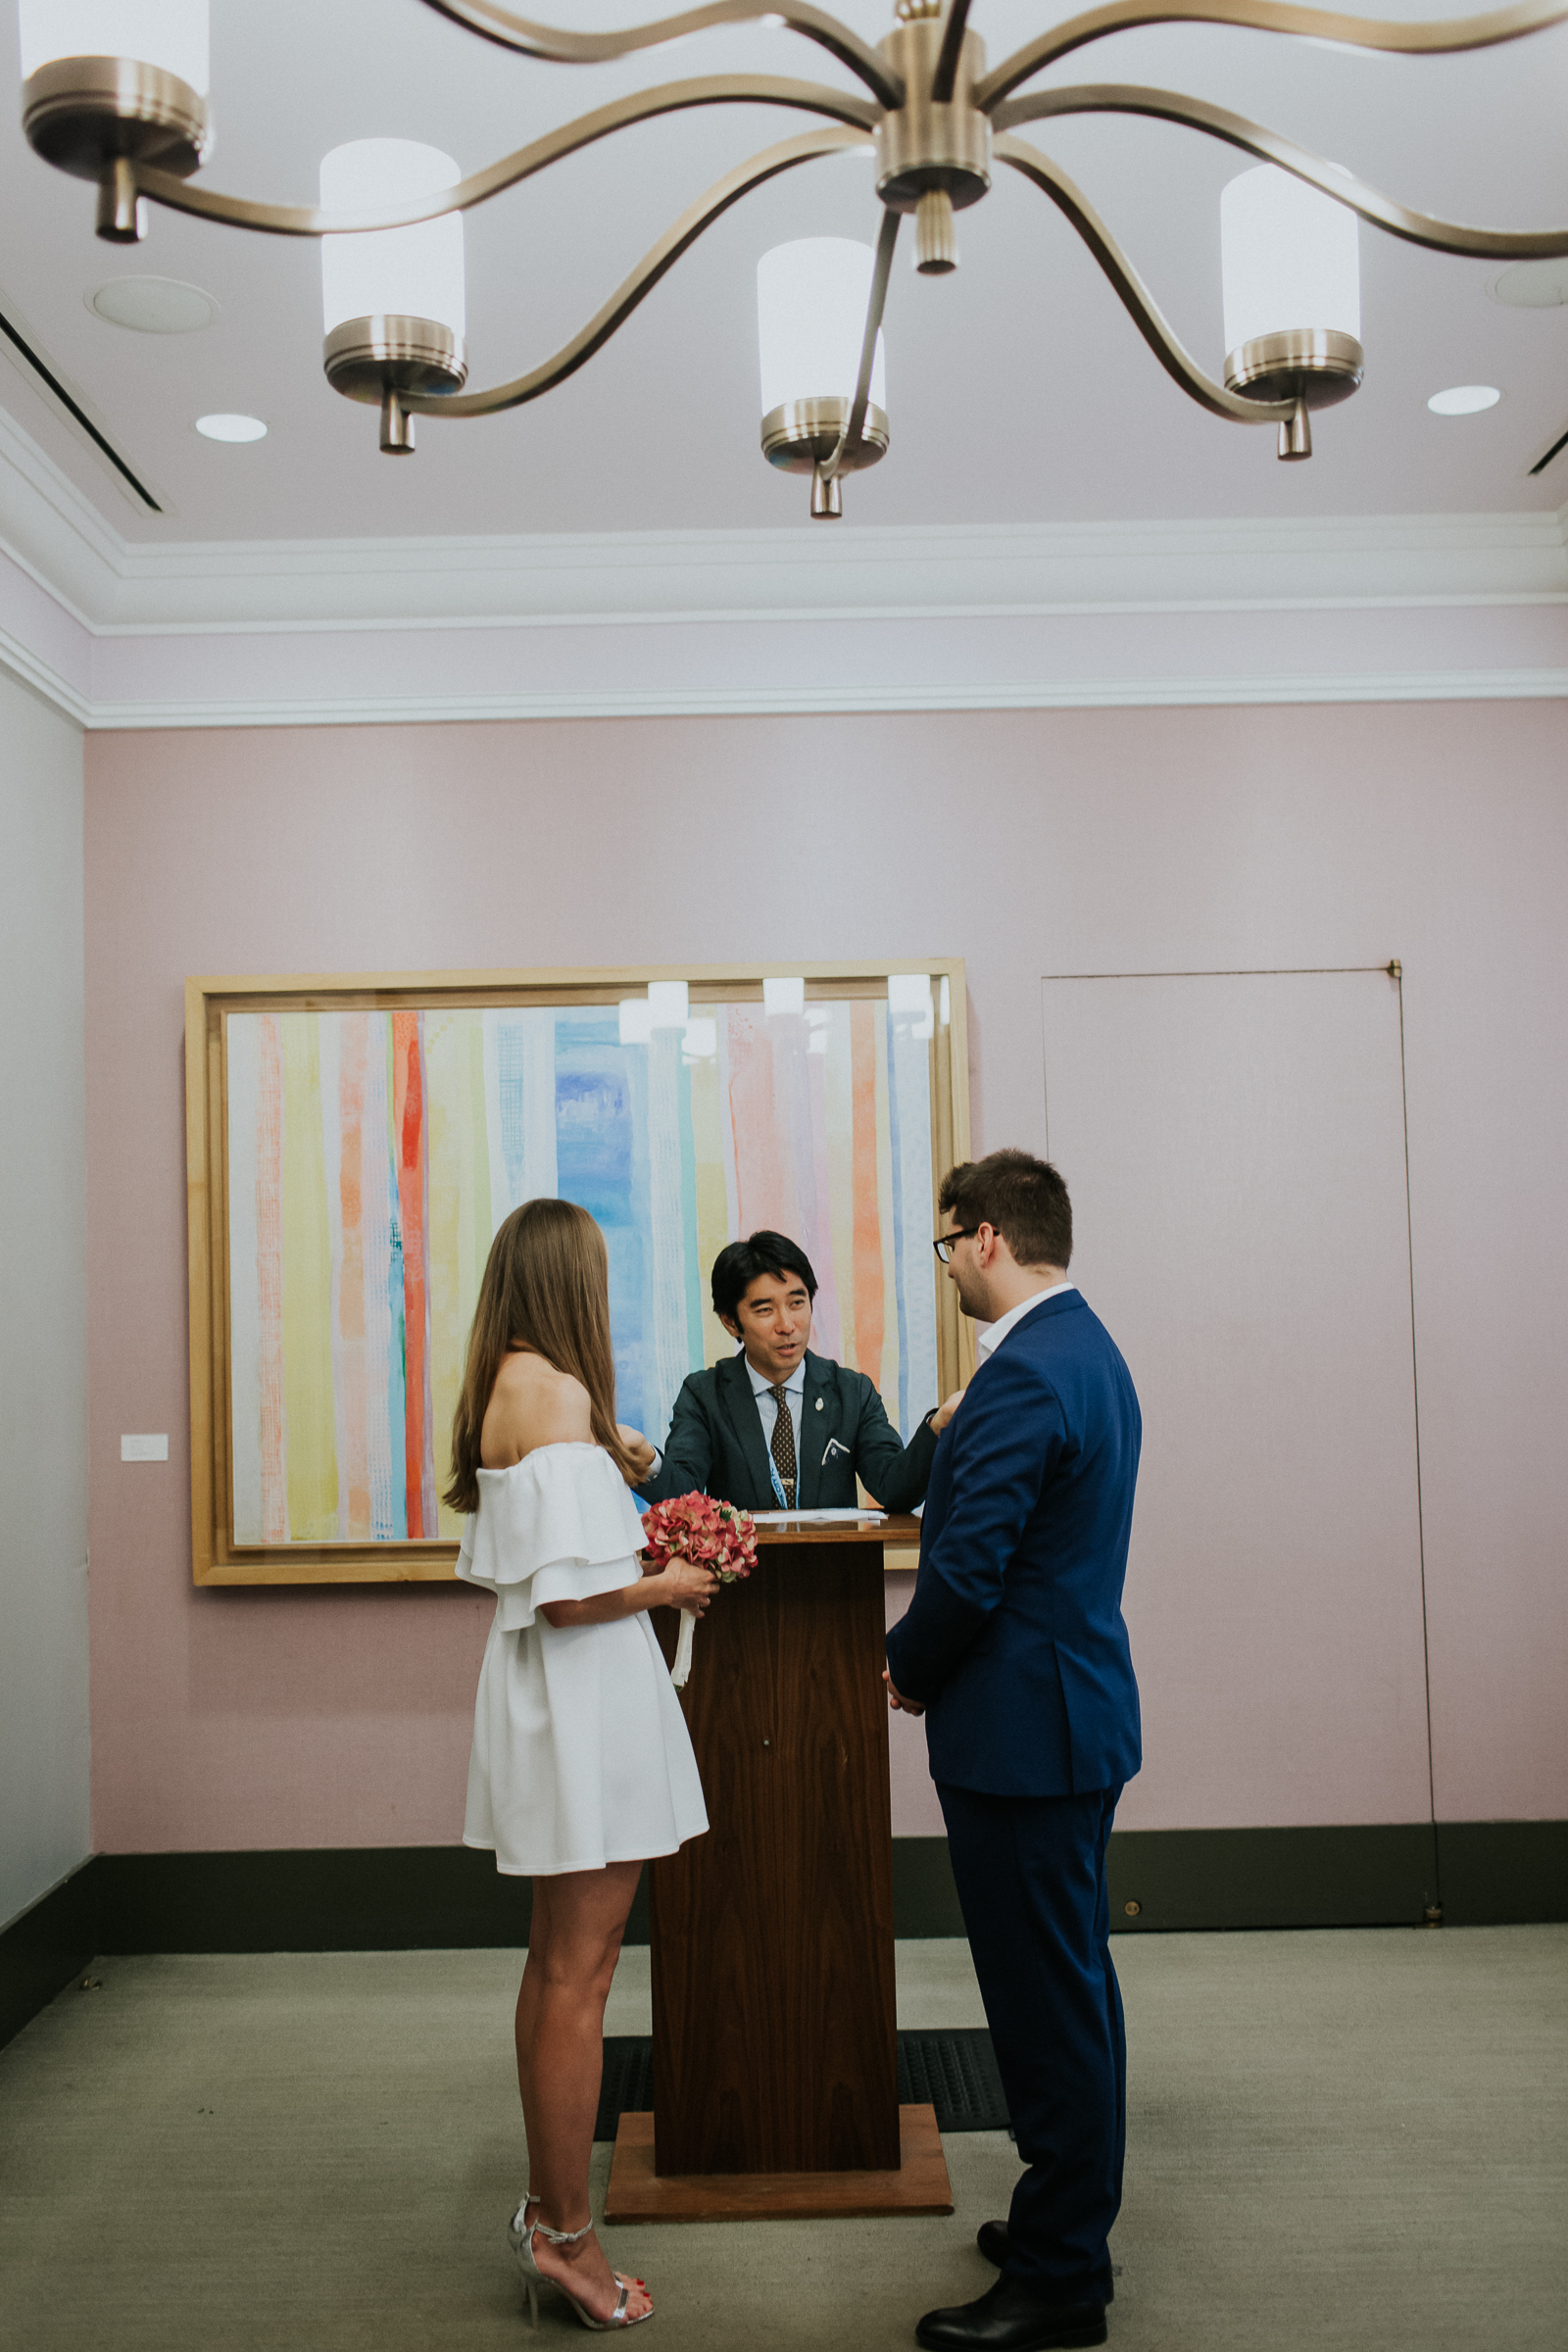 New-York-City-Hall-Elopement-NYC-Documentary-Wedding-Photographer-44.jpg